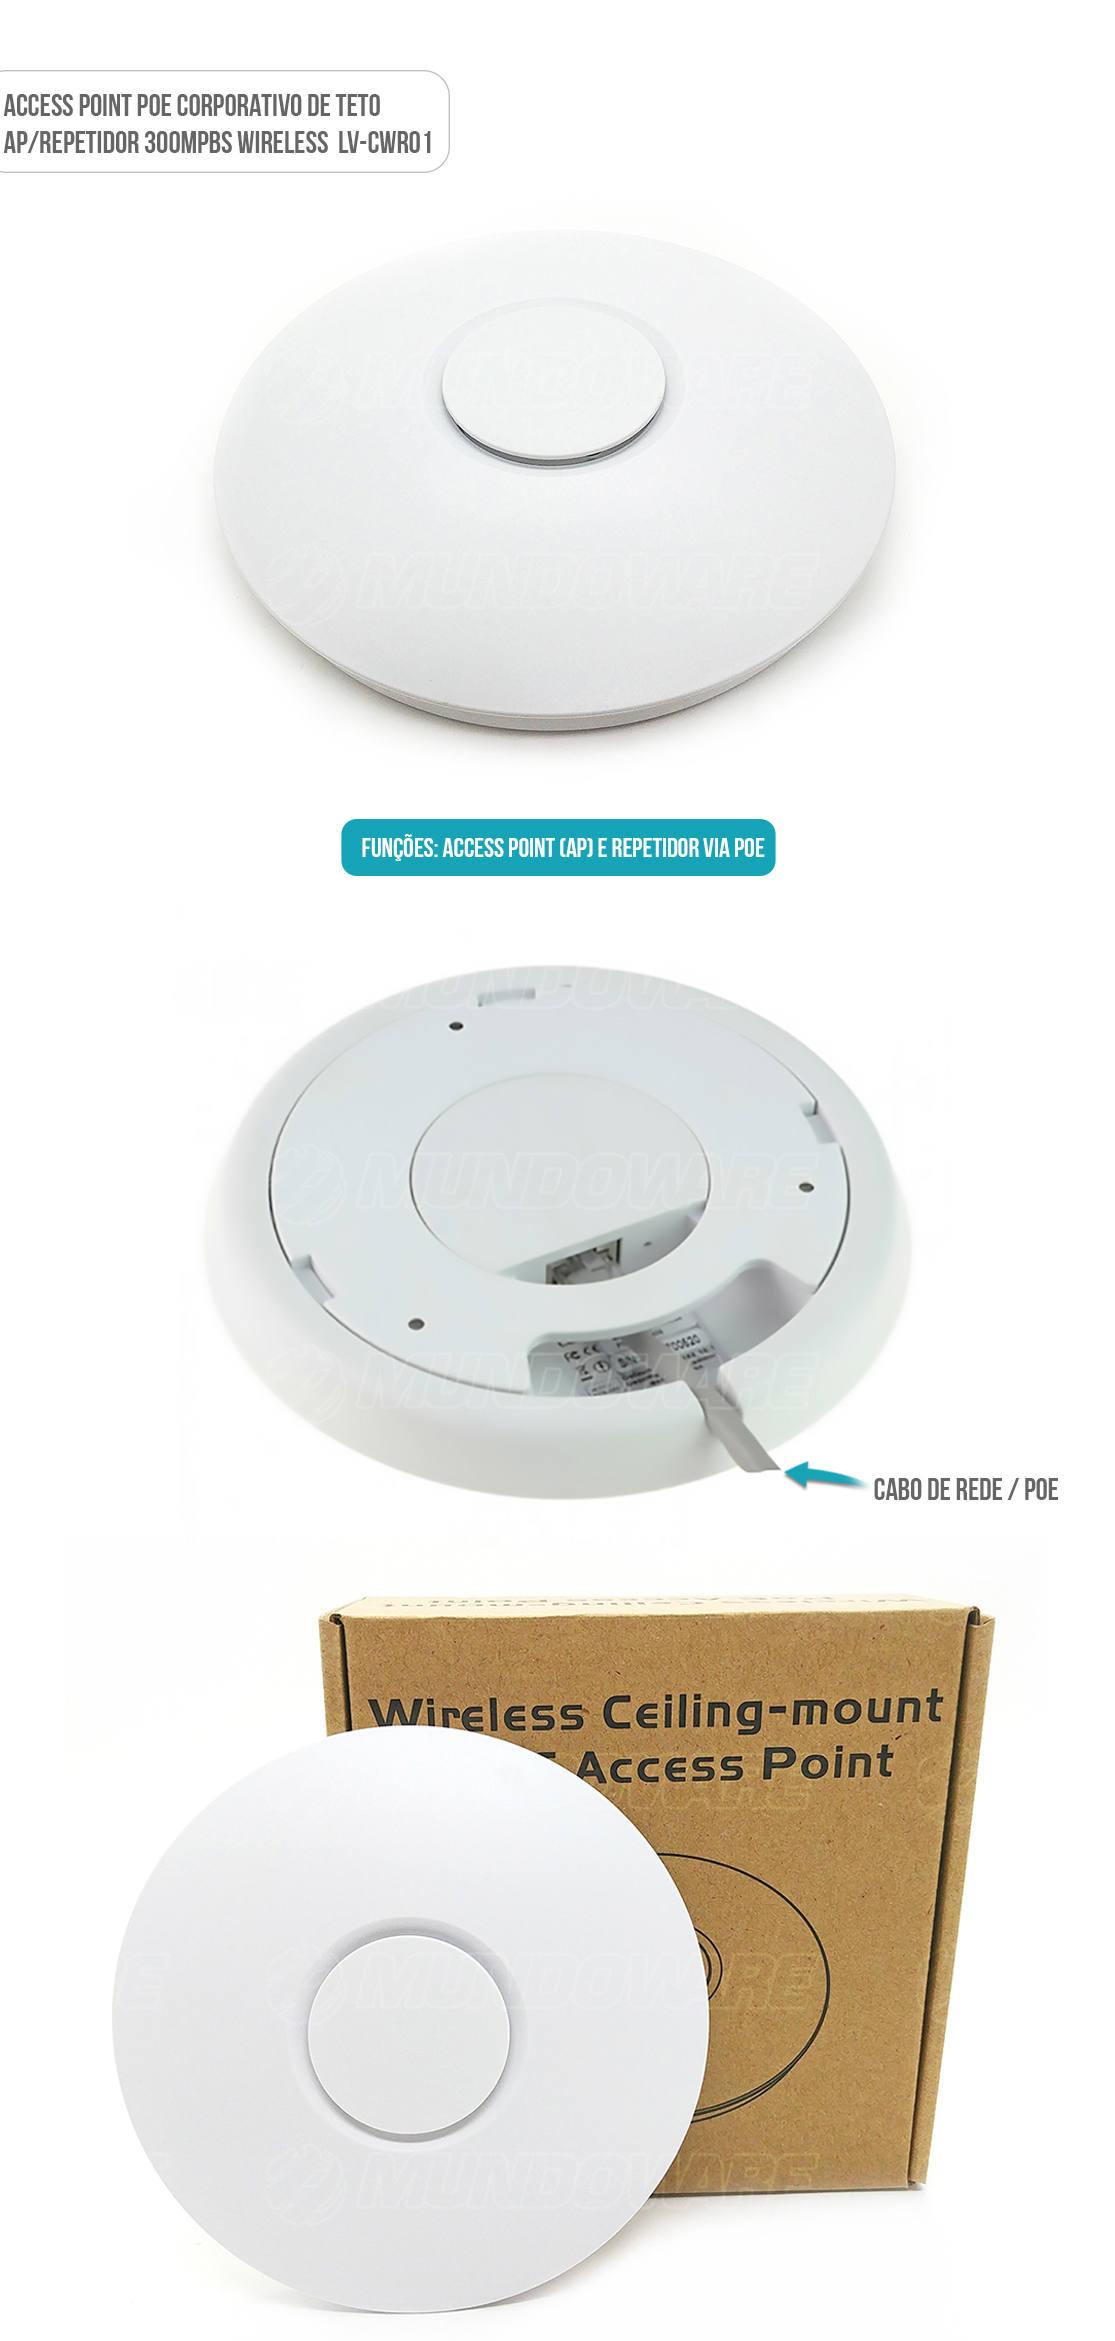 Access Point Corporativo de Teto 300Mpbs Wireless POE